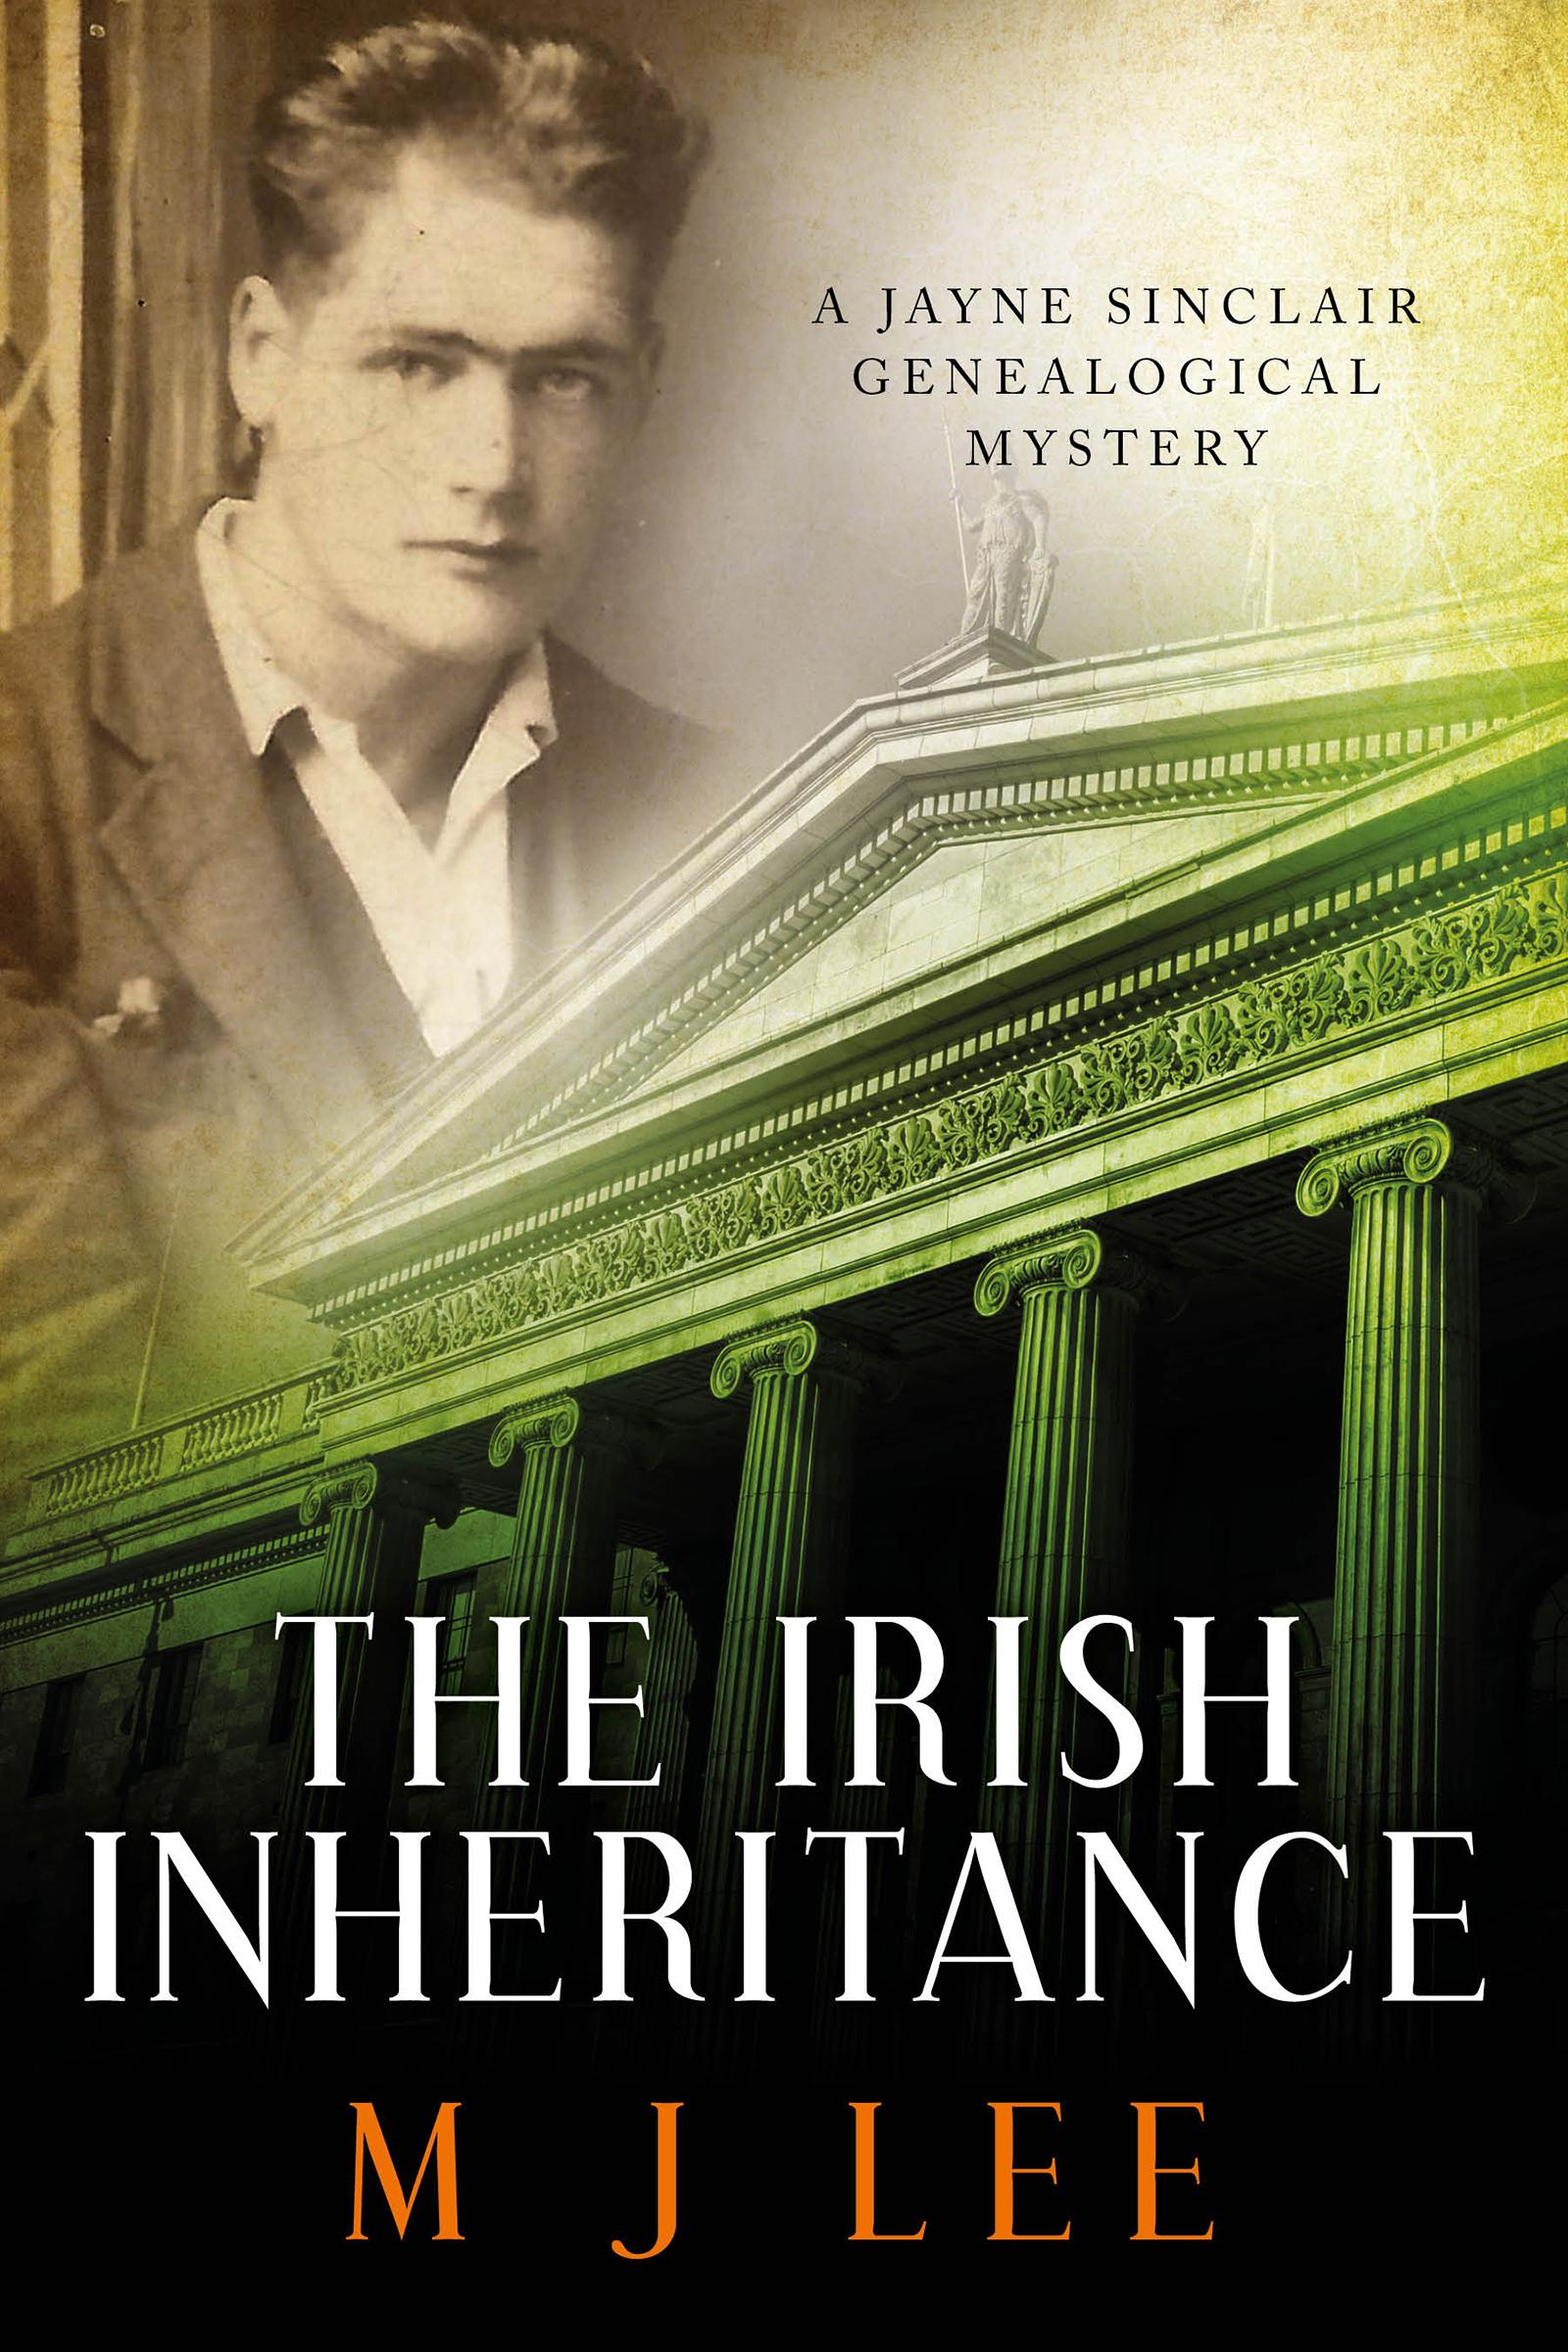 The Irish Inheritance Cover LARGE EBOOK.jpg